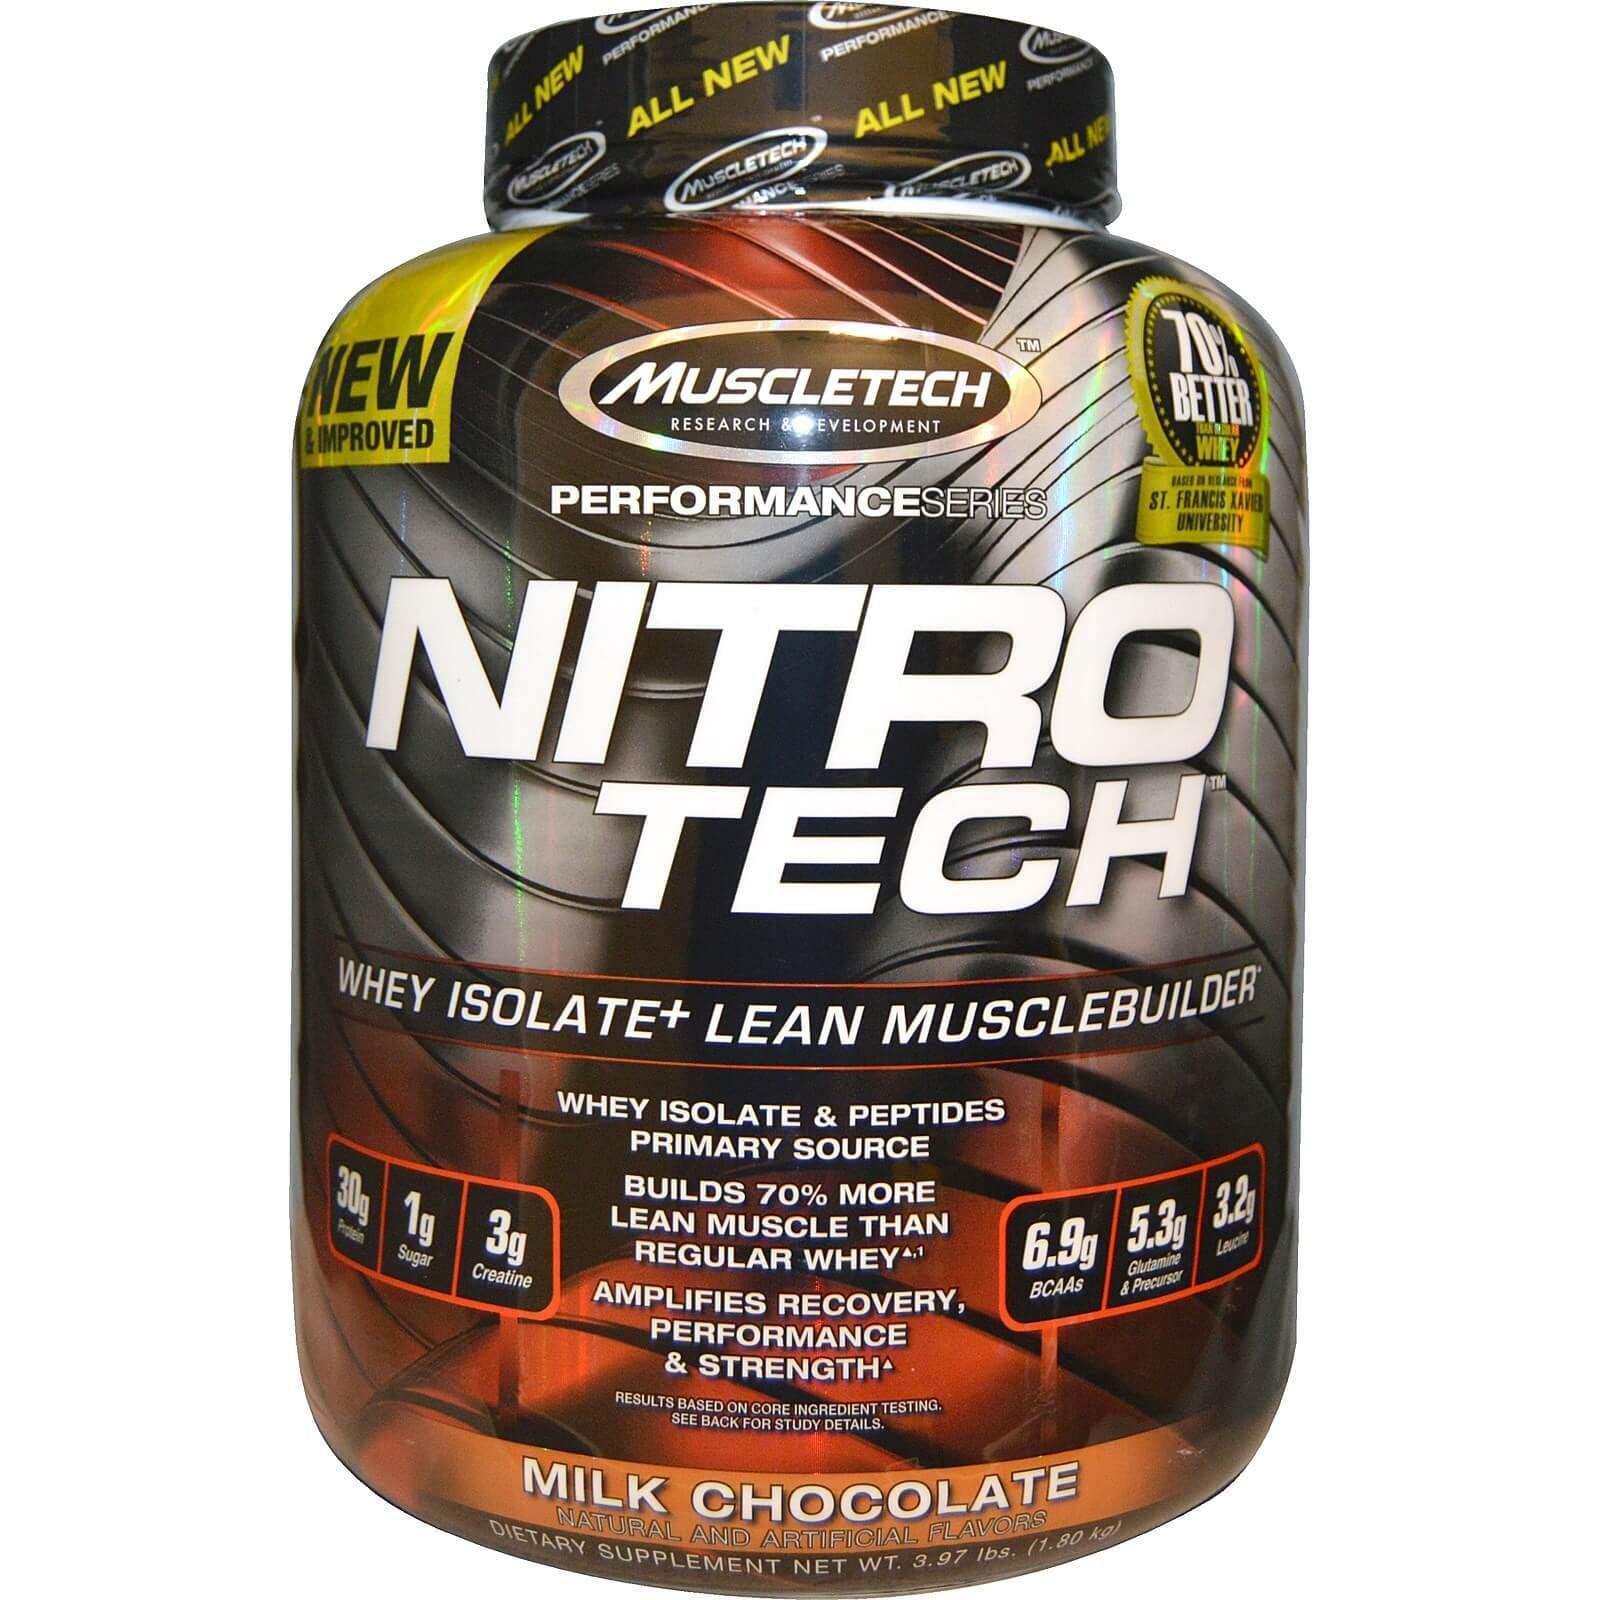 אבקת חלבון נייטרו טק עם קריאטין | NitroTech of MuscleTech